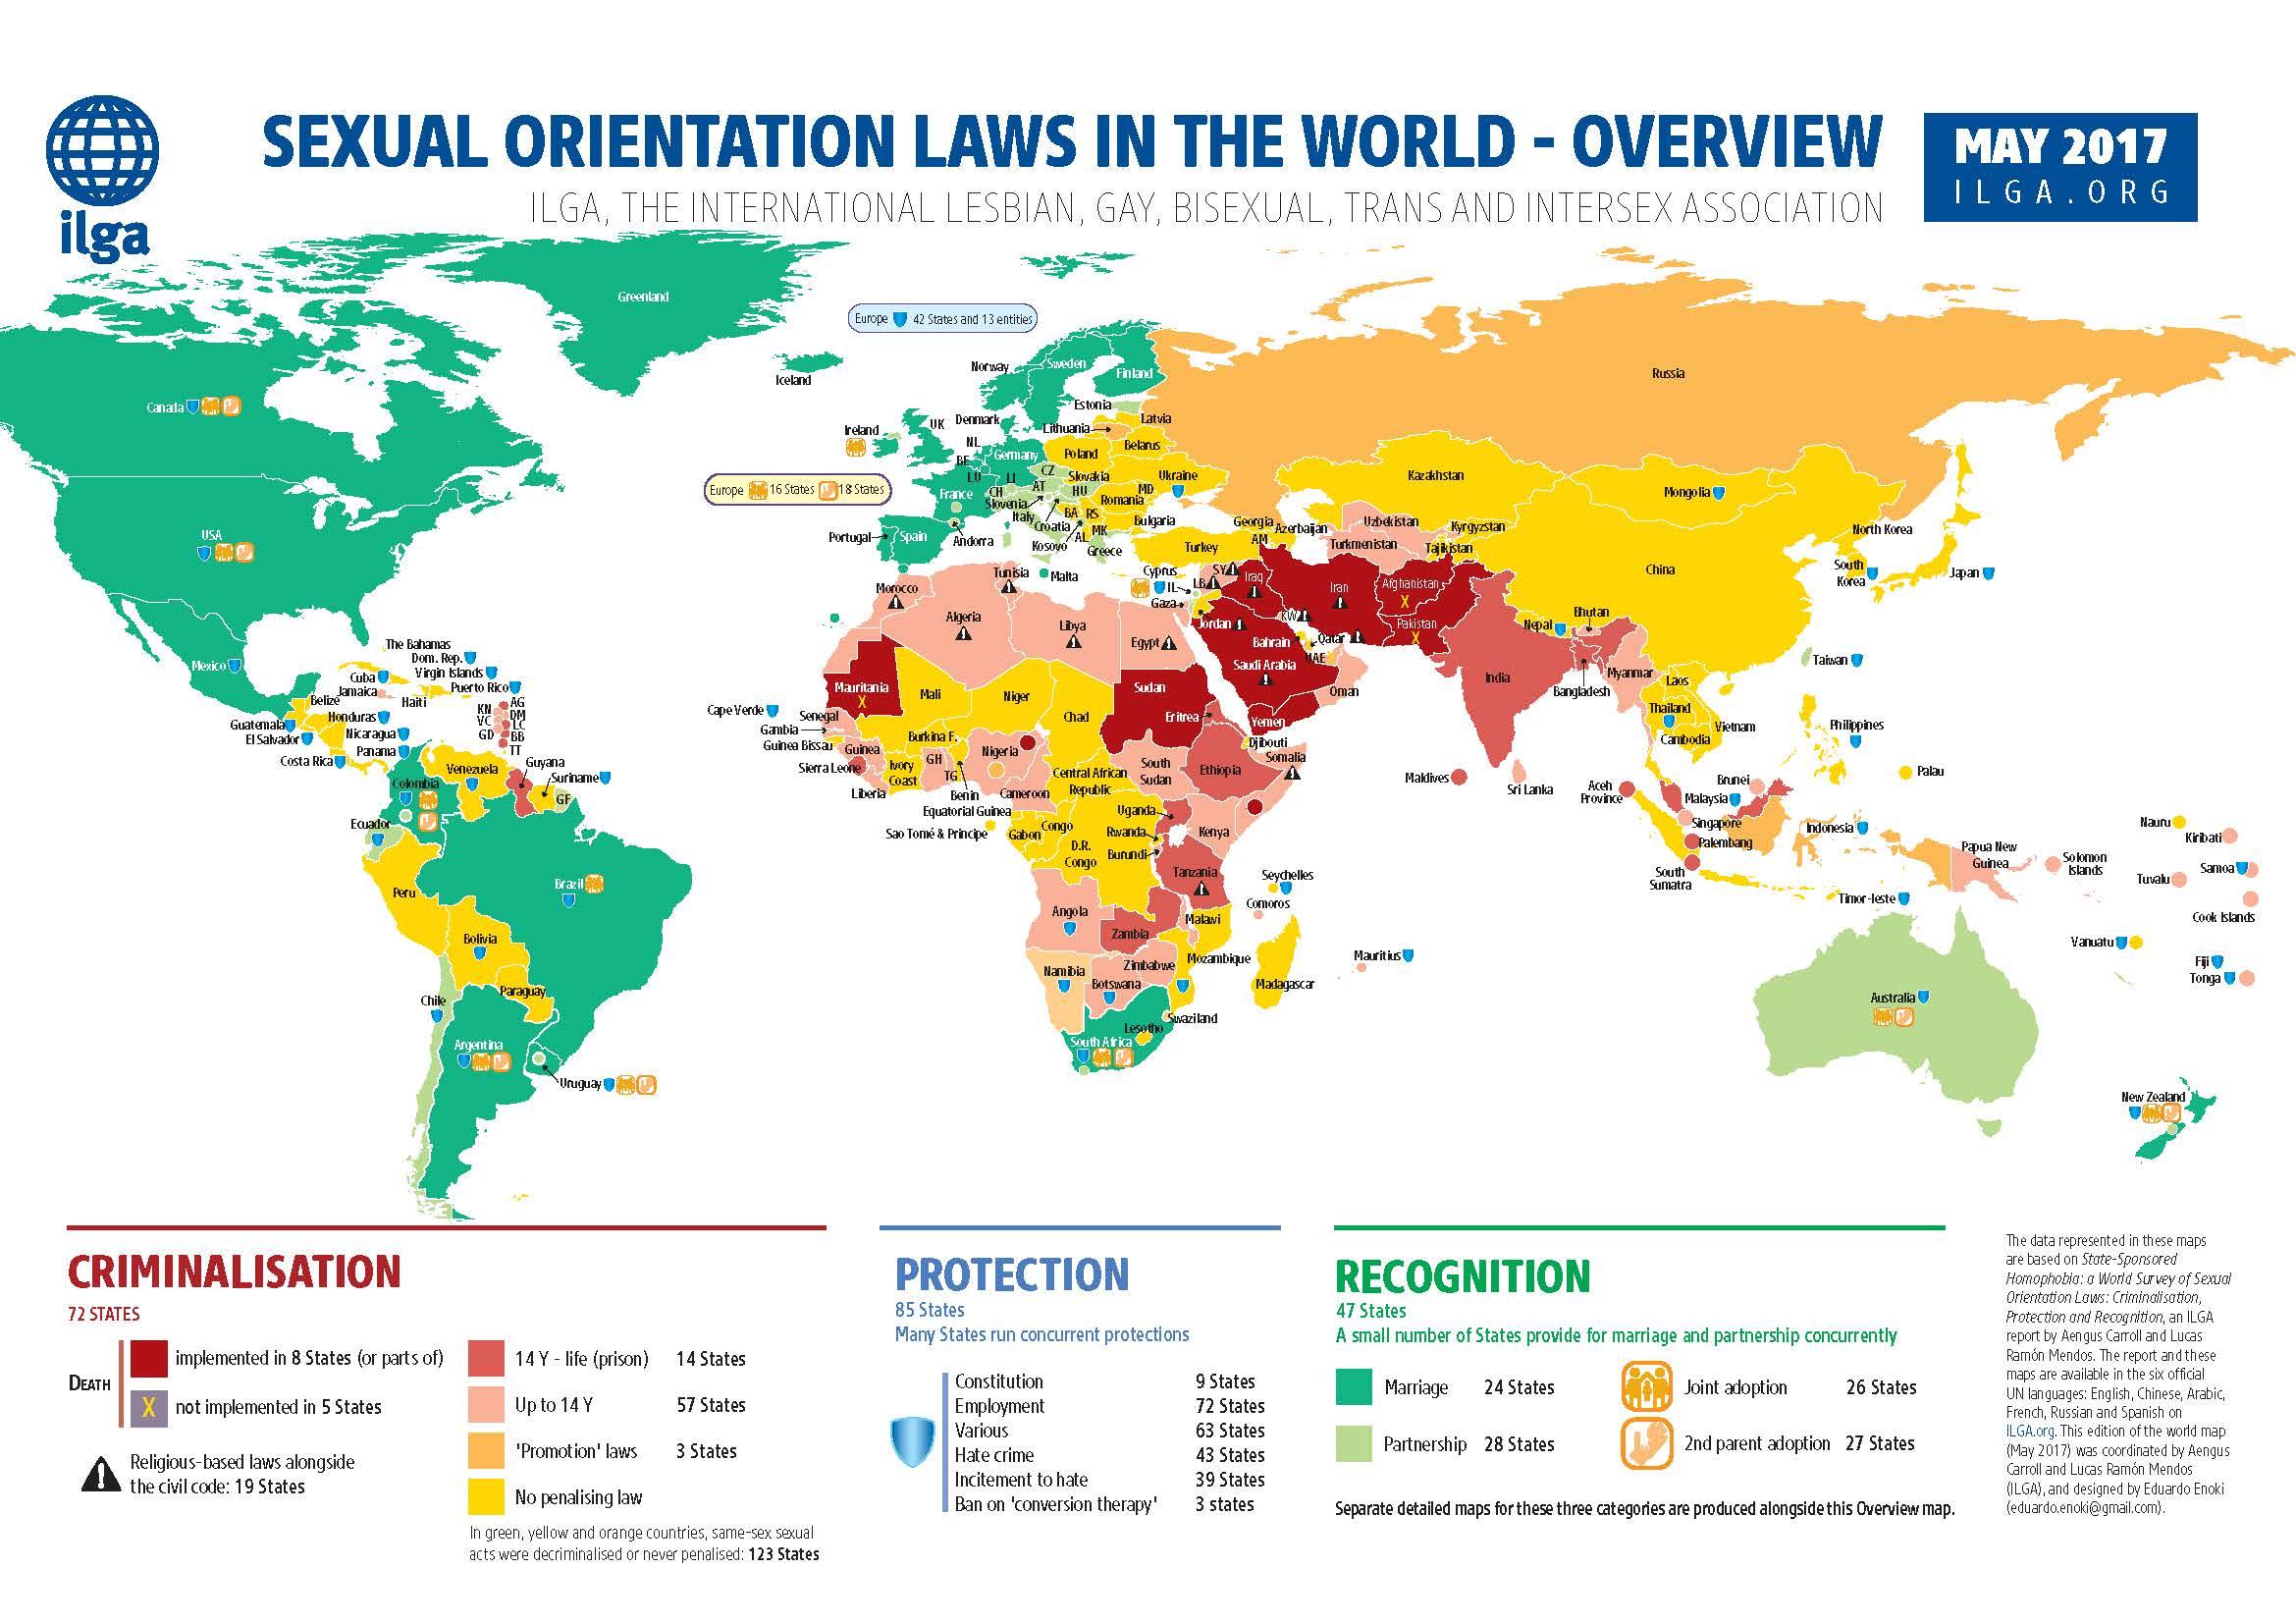 https://ilga.org/downloads/2017/ILGA_WorldMap_ENGLISH_Overview_2017.pdf